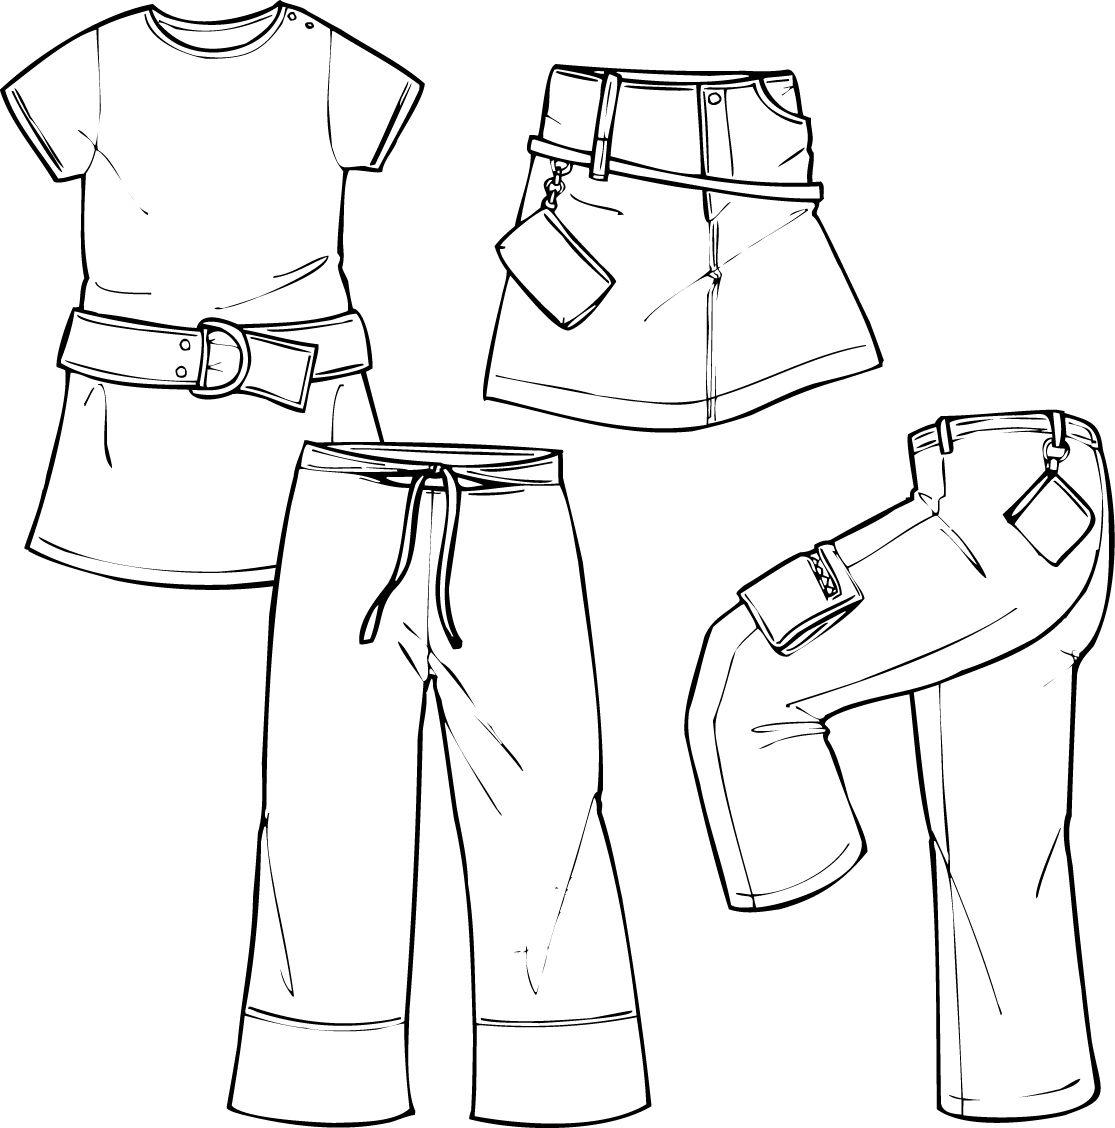 Croquis jupe , pantalon & robe | Fashion croquis templates ...